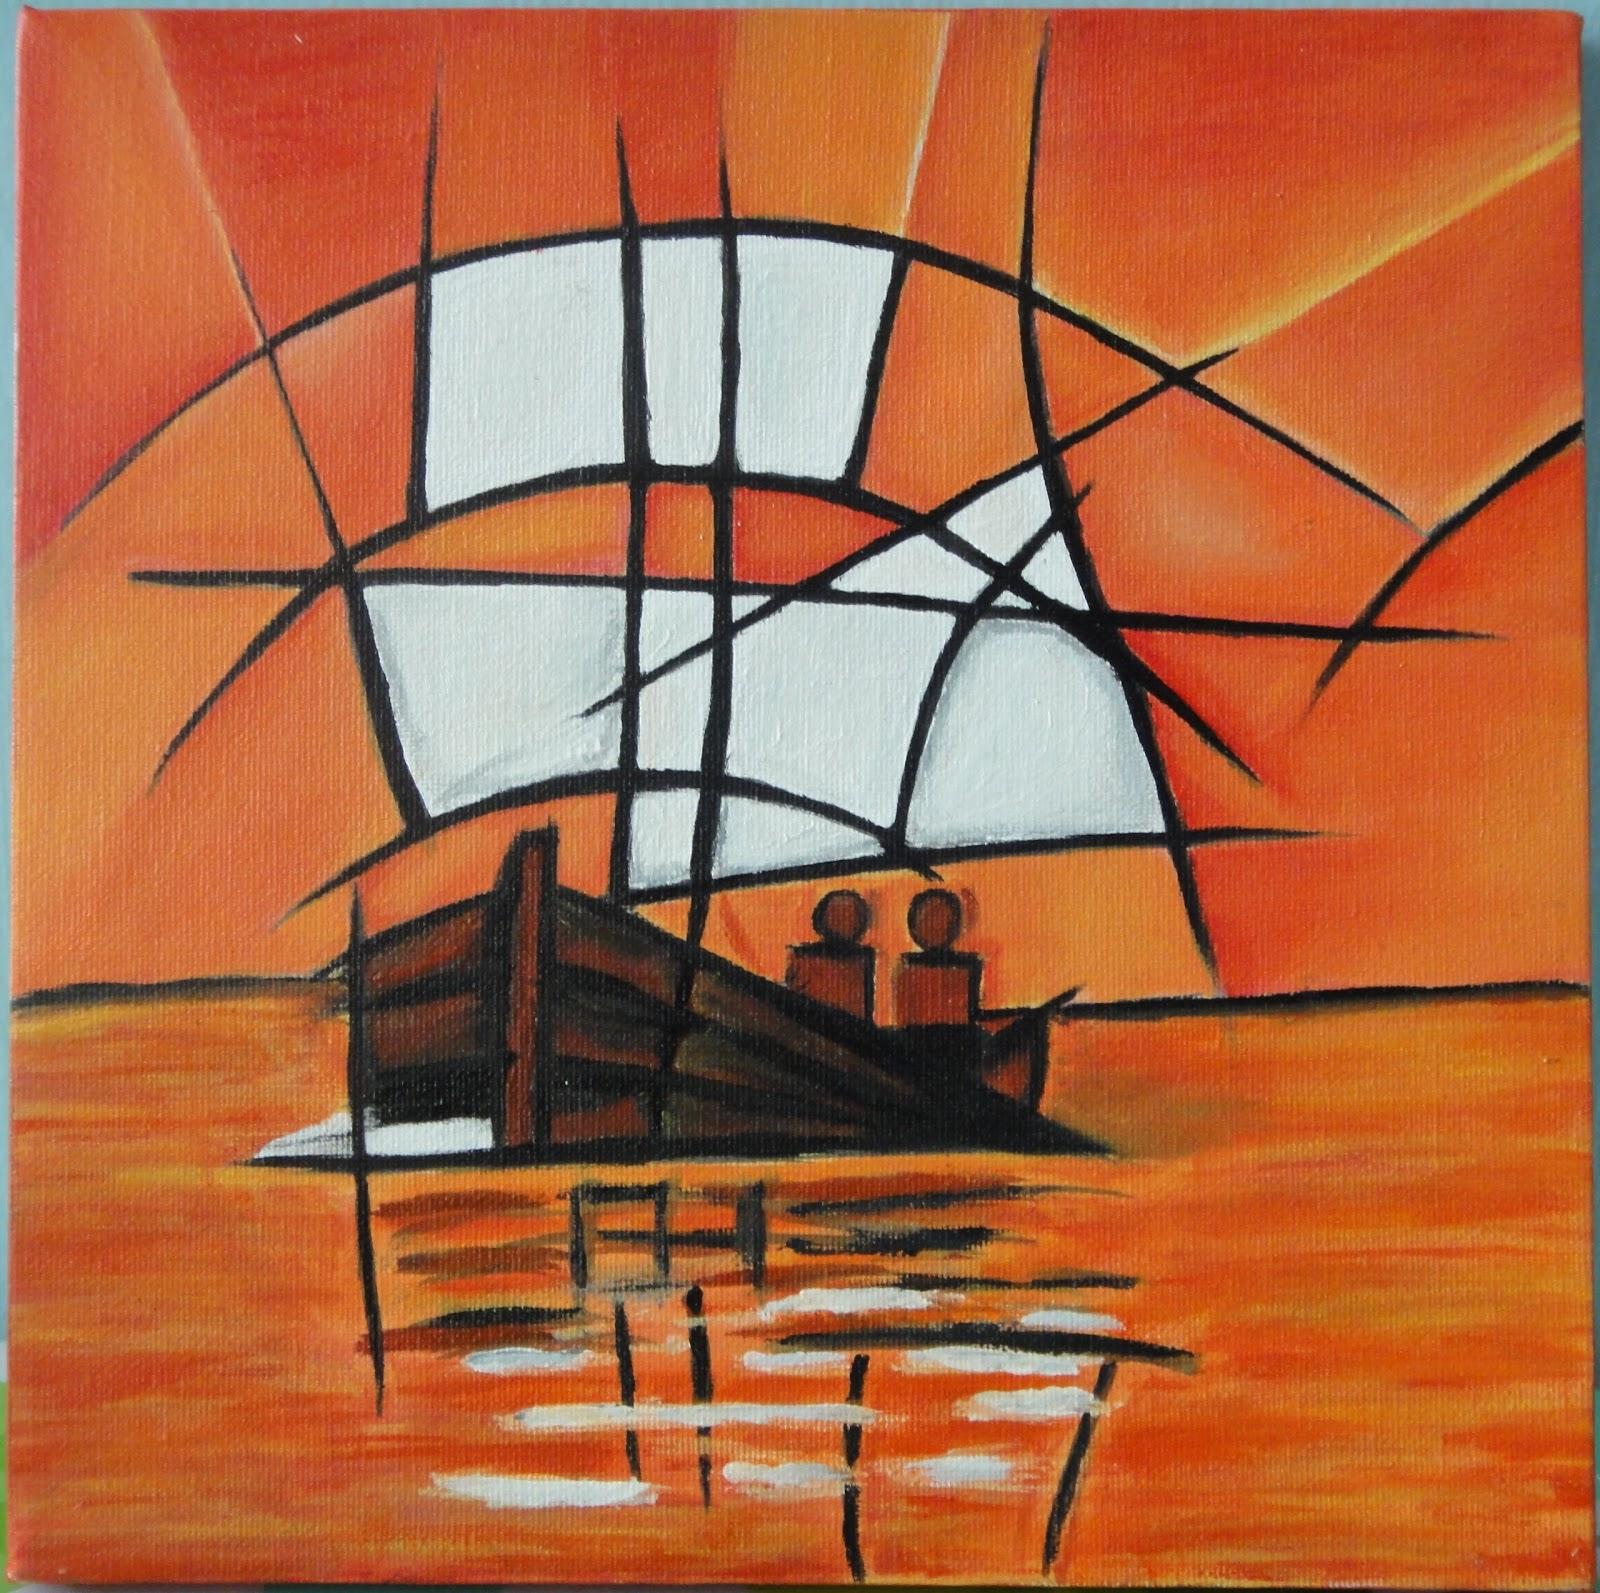 Geeths Gallery: Canvas paintings